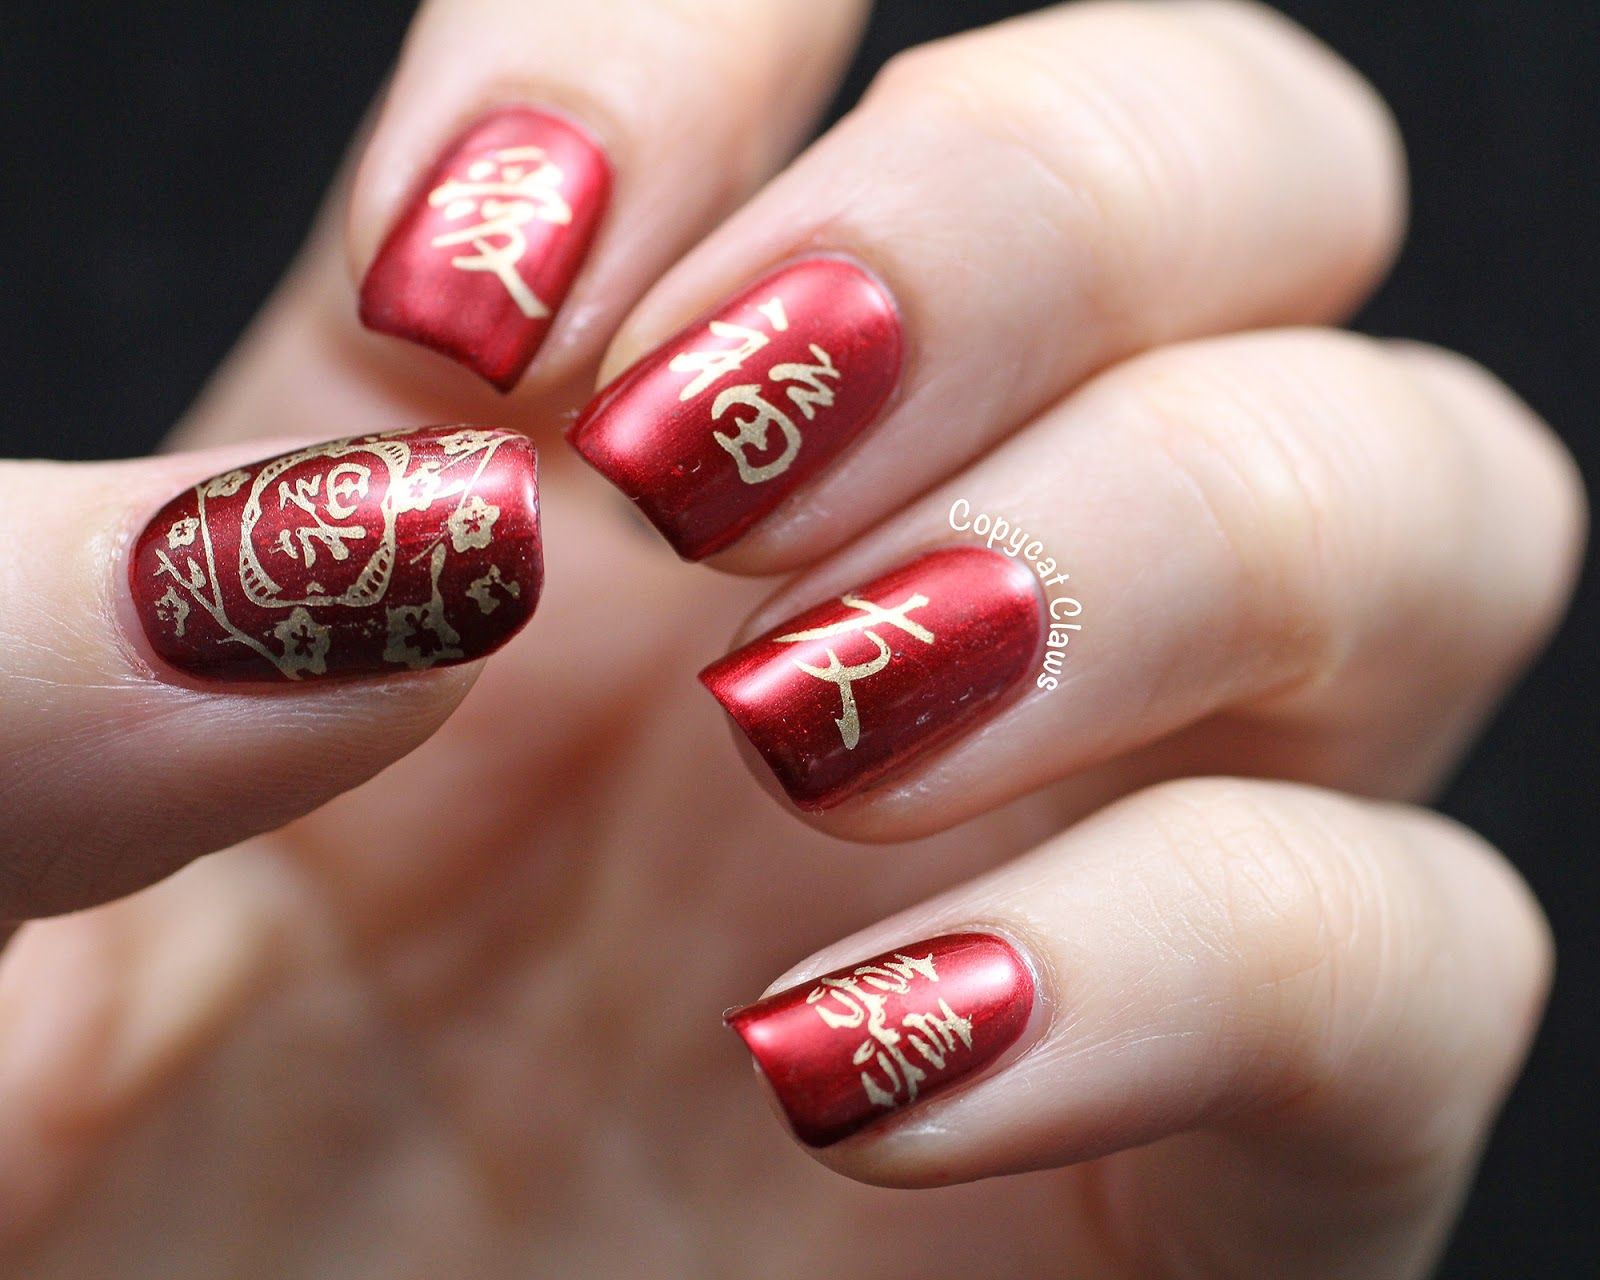 Copycat Claws Chinese New Year Nail Art Aka Sunday